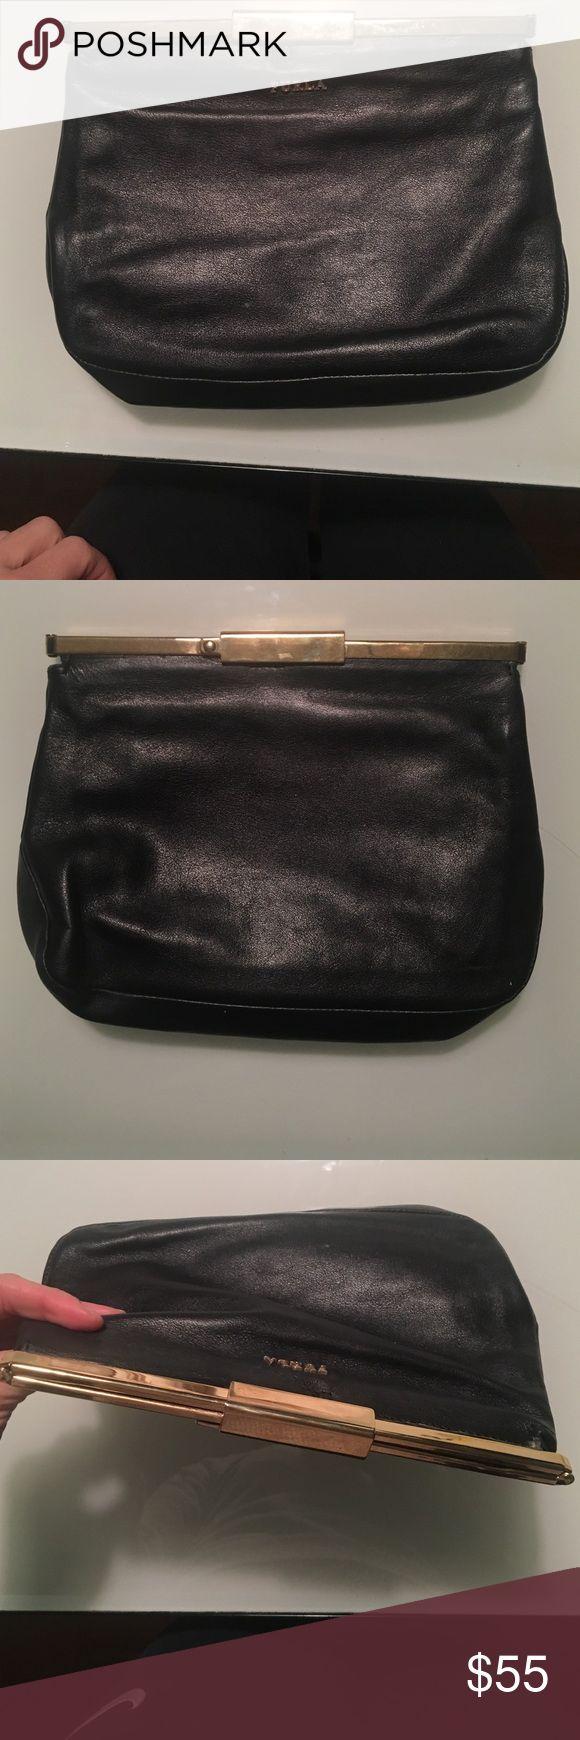 Furla clutch used Furla black leather clutch. Furla Bags Clutches & Wristlets